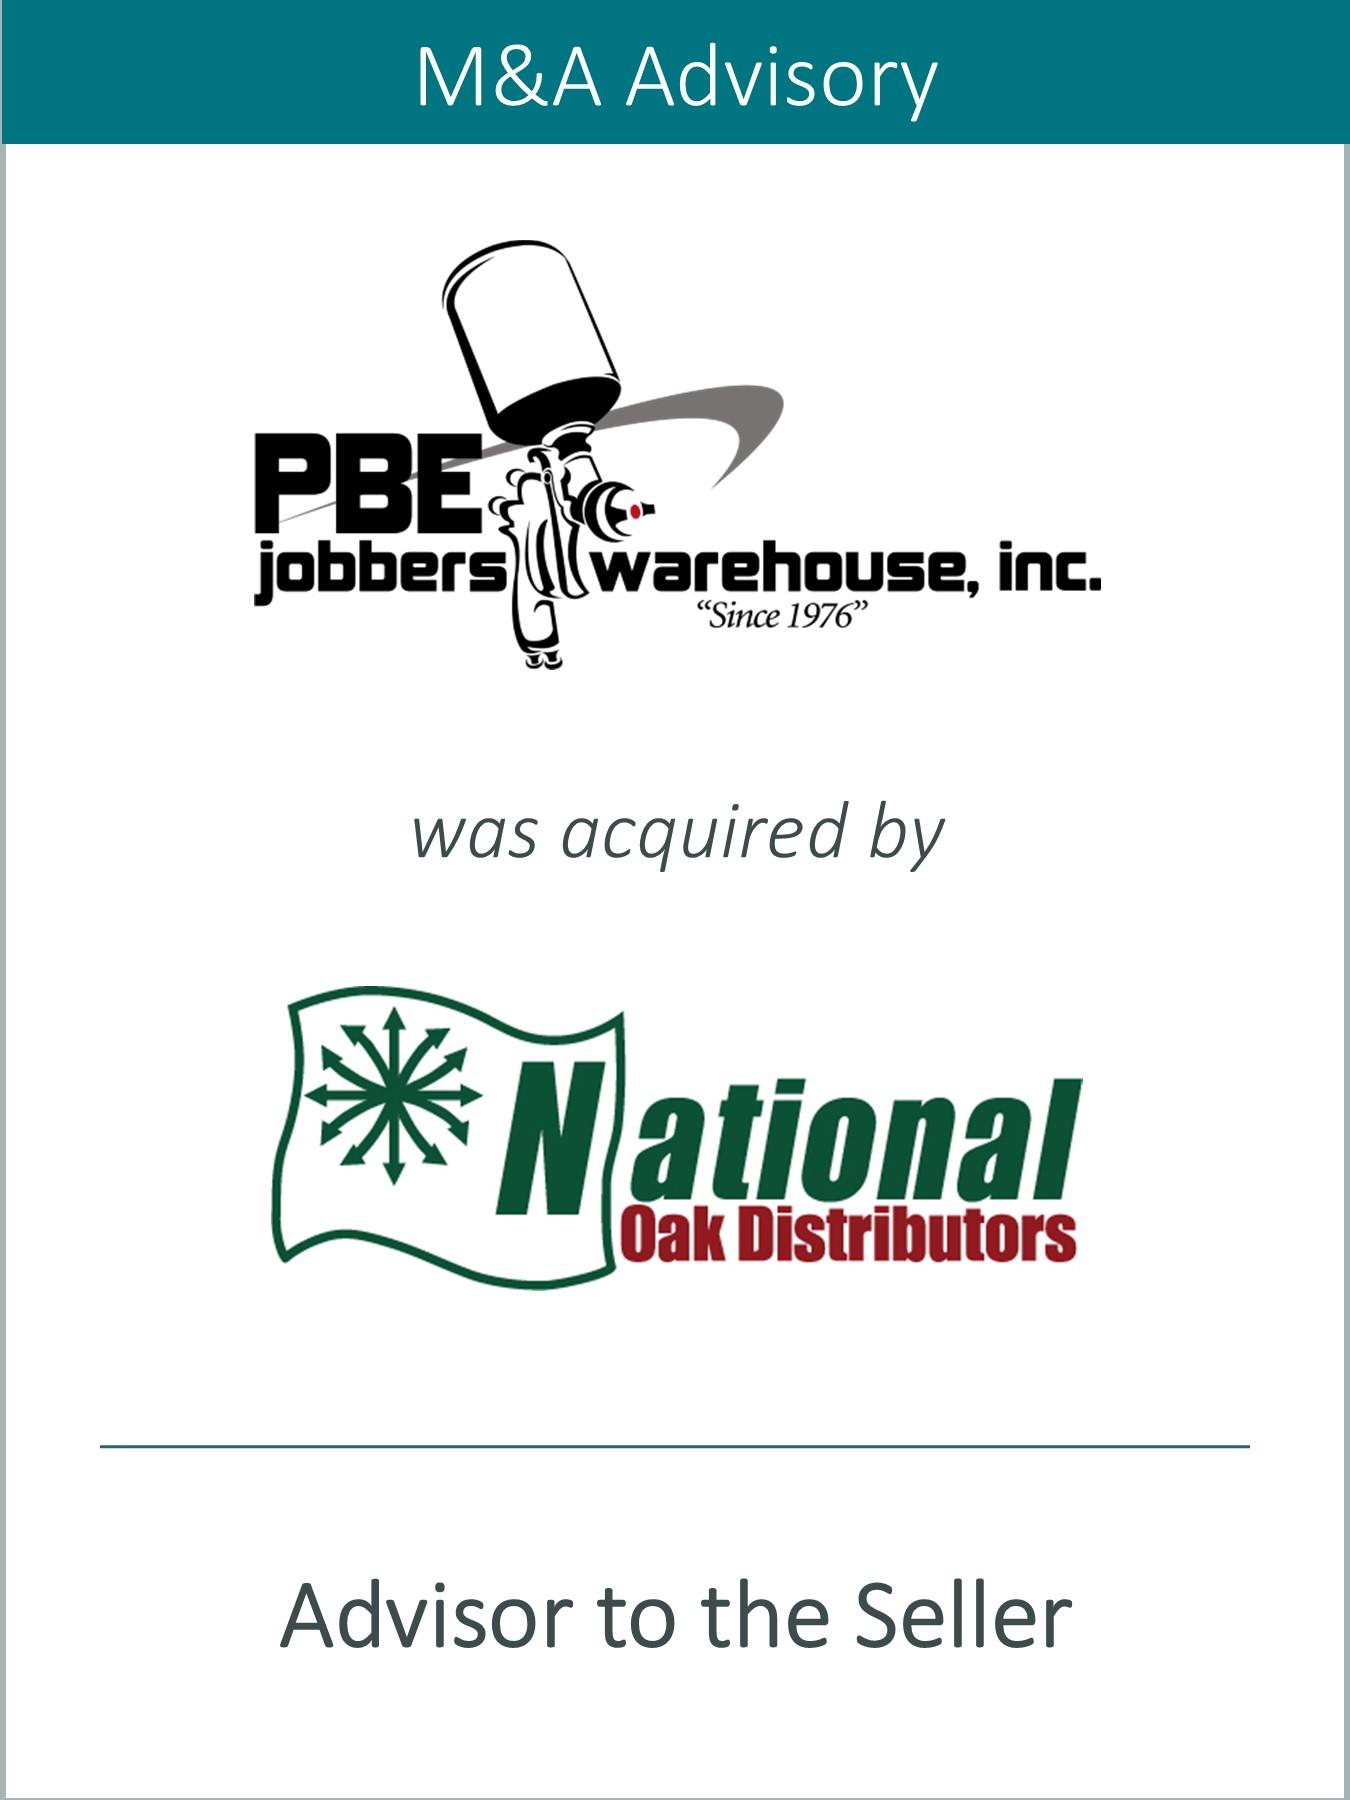 Prairie Represents PBE Jobbers Warehouse, Inc. in its Sale to National Oak Distributors, Inc.